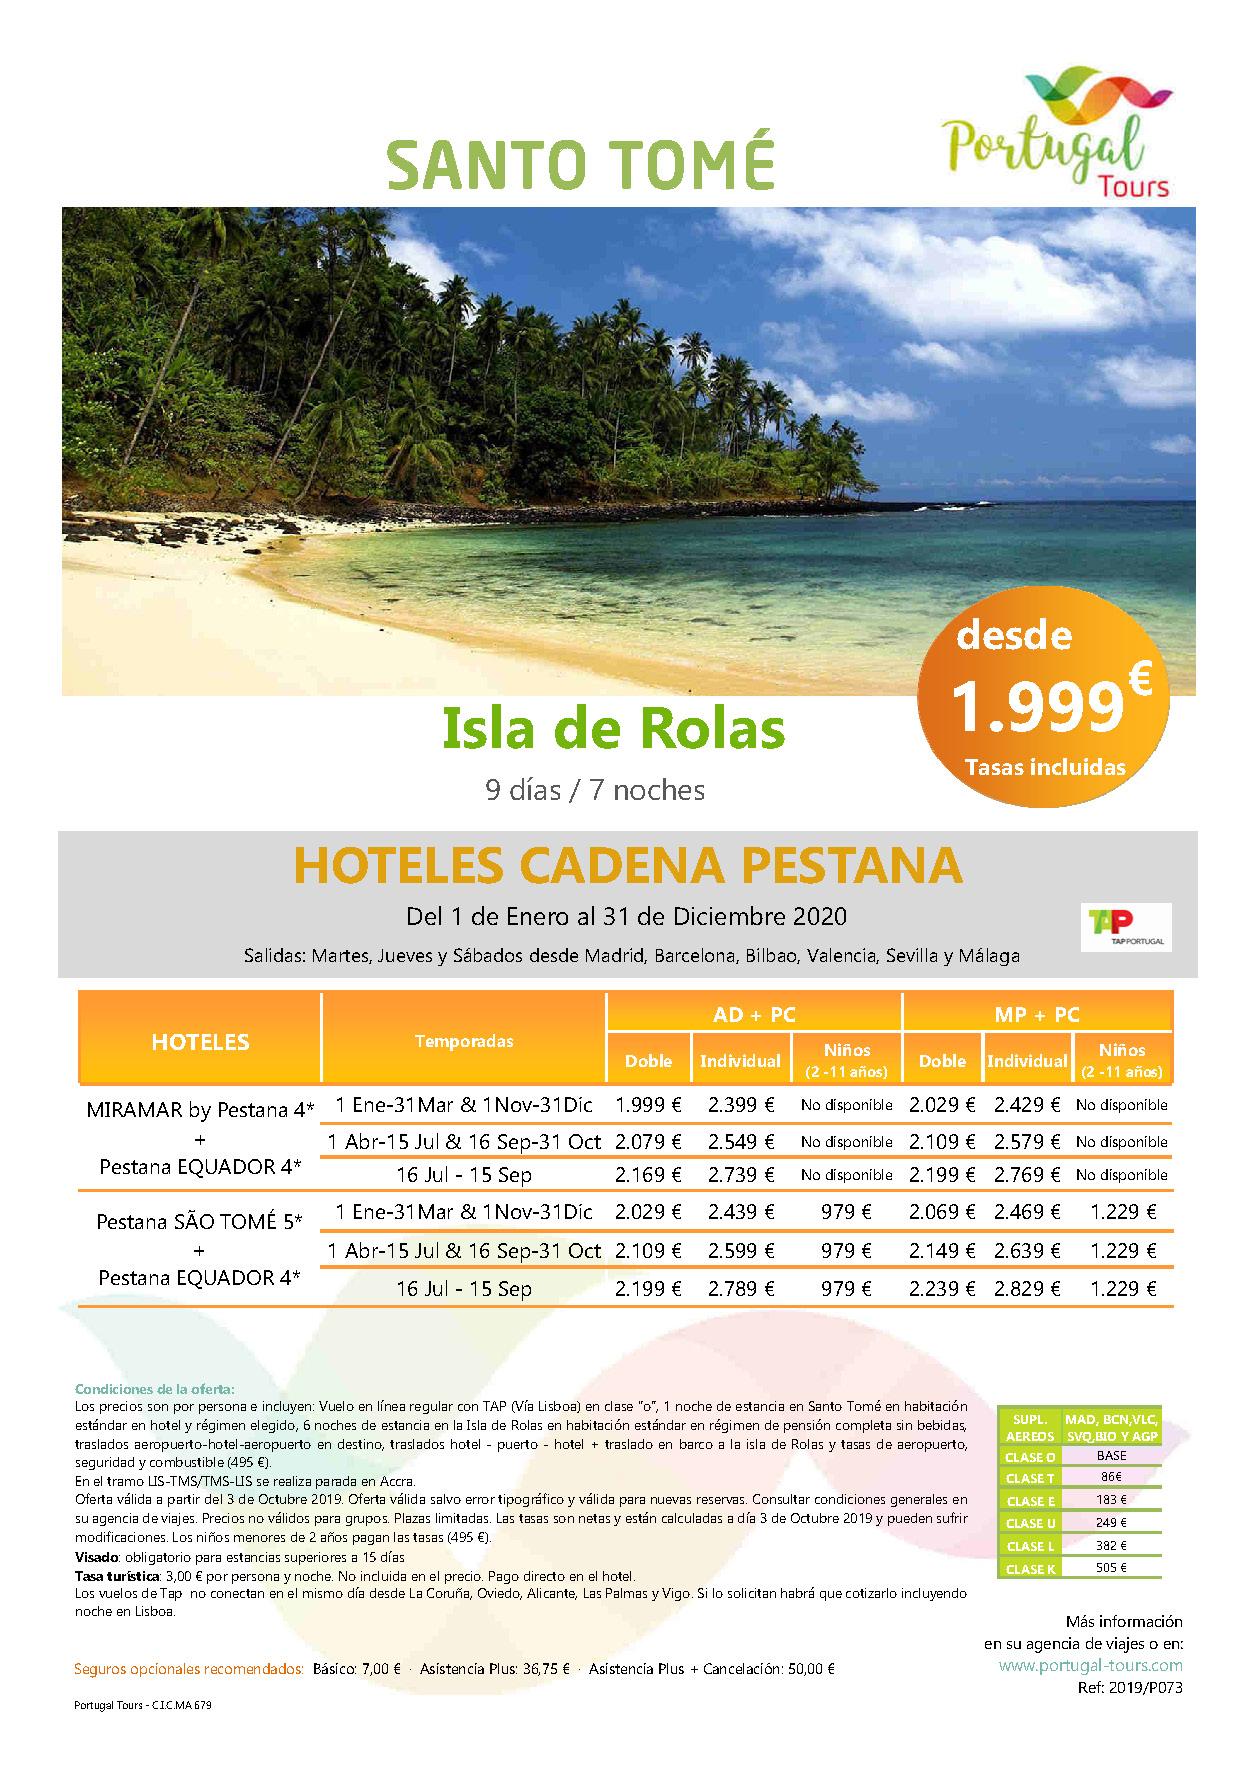 Oferta Portugal Tours Estancias Santo Tome y Rolas 2020